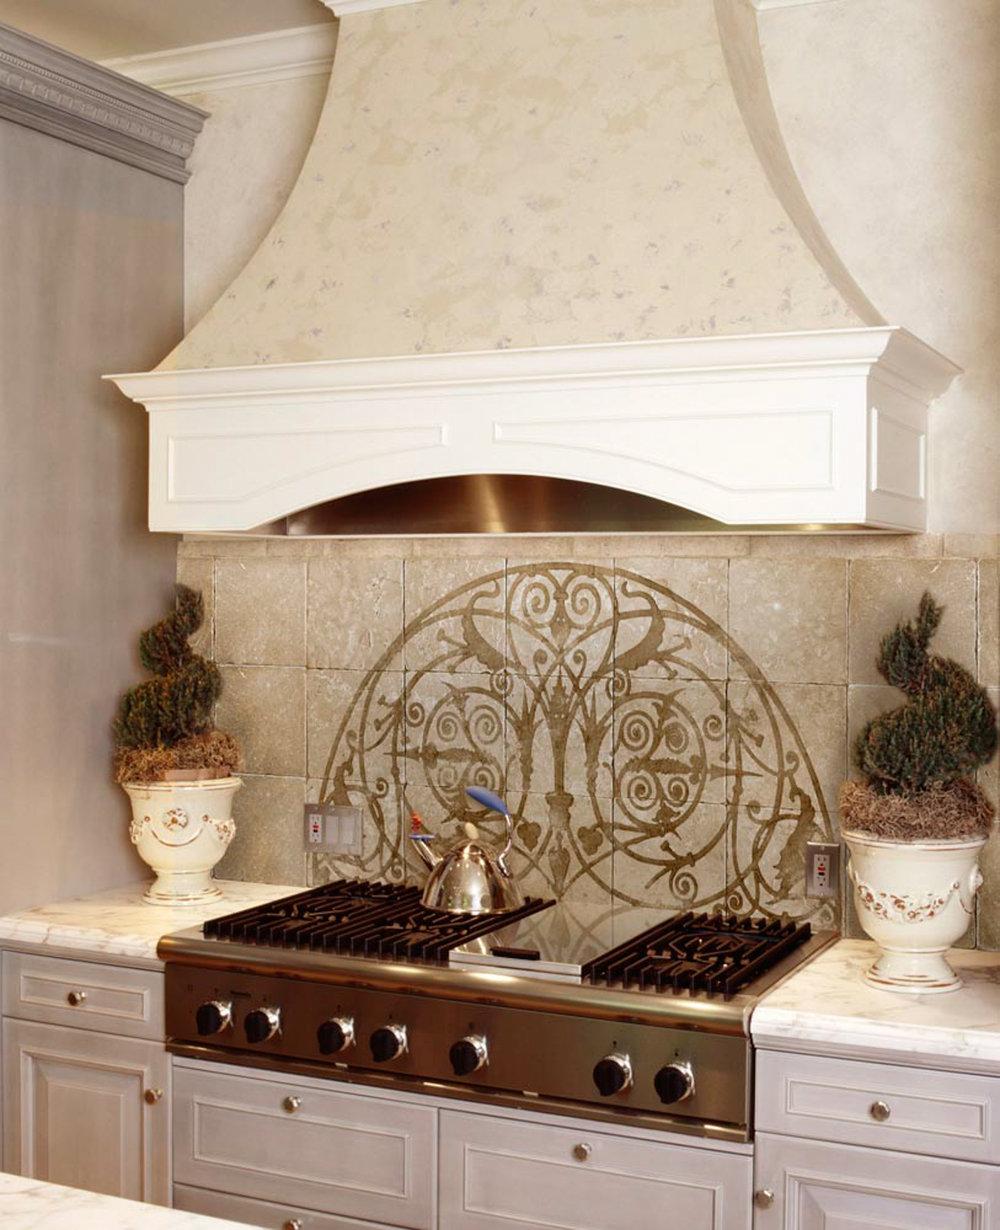 kitchen_backsplash_mural_1000_19.jpg